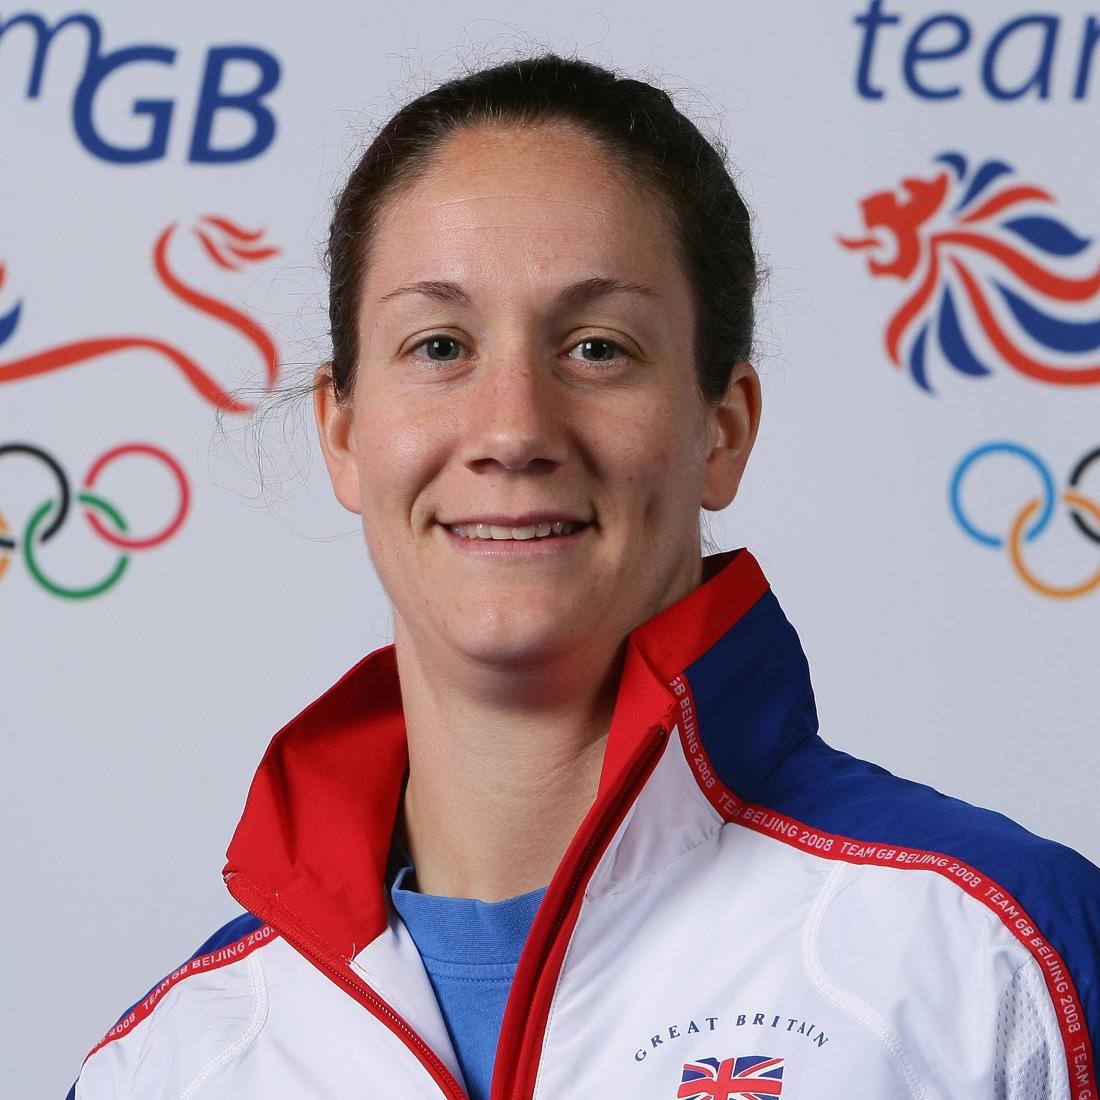 Michaela-Breeze-female-Olympic-weightlifter-speaker-at-Great-British-Speakers